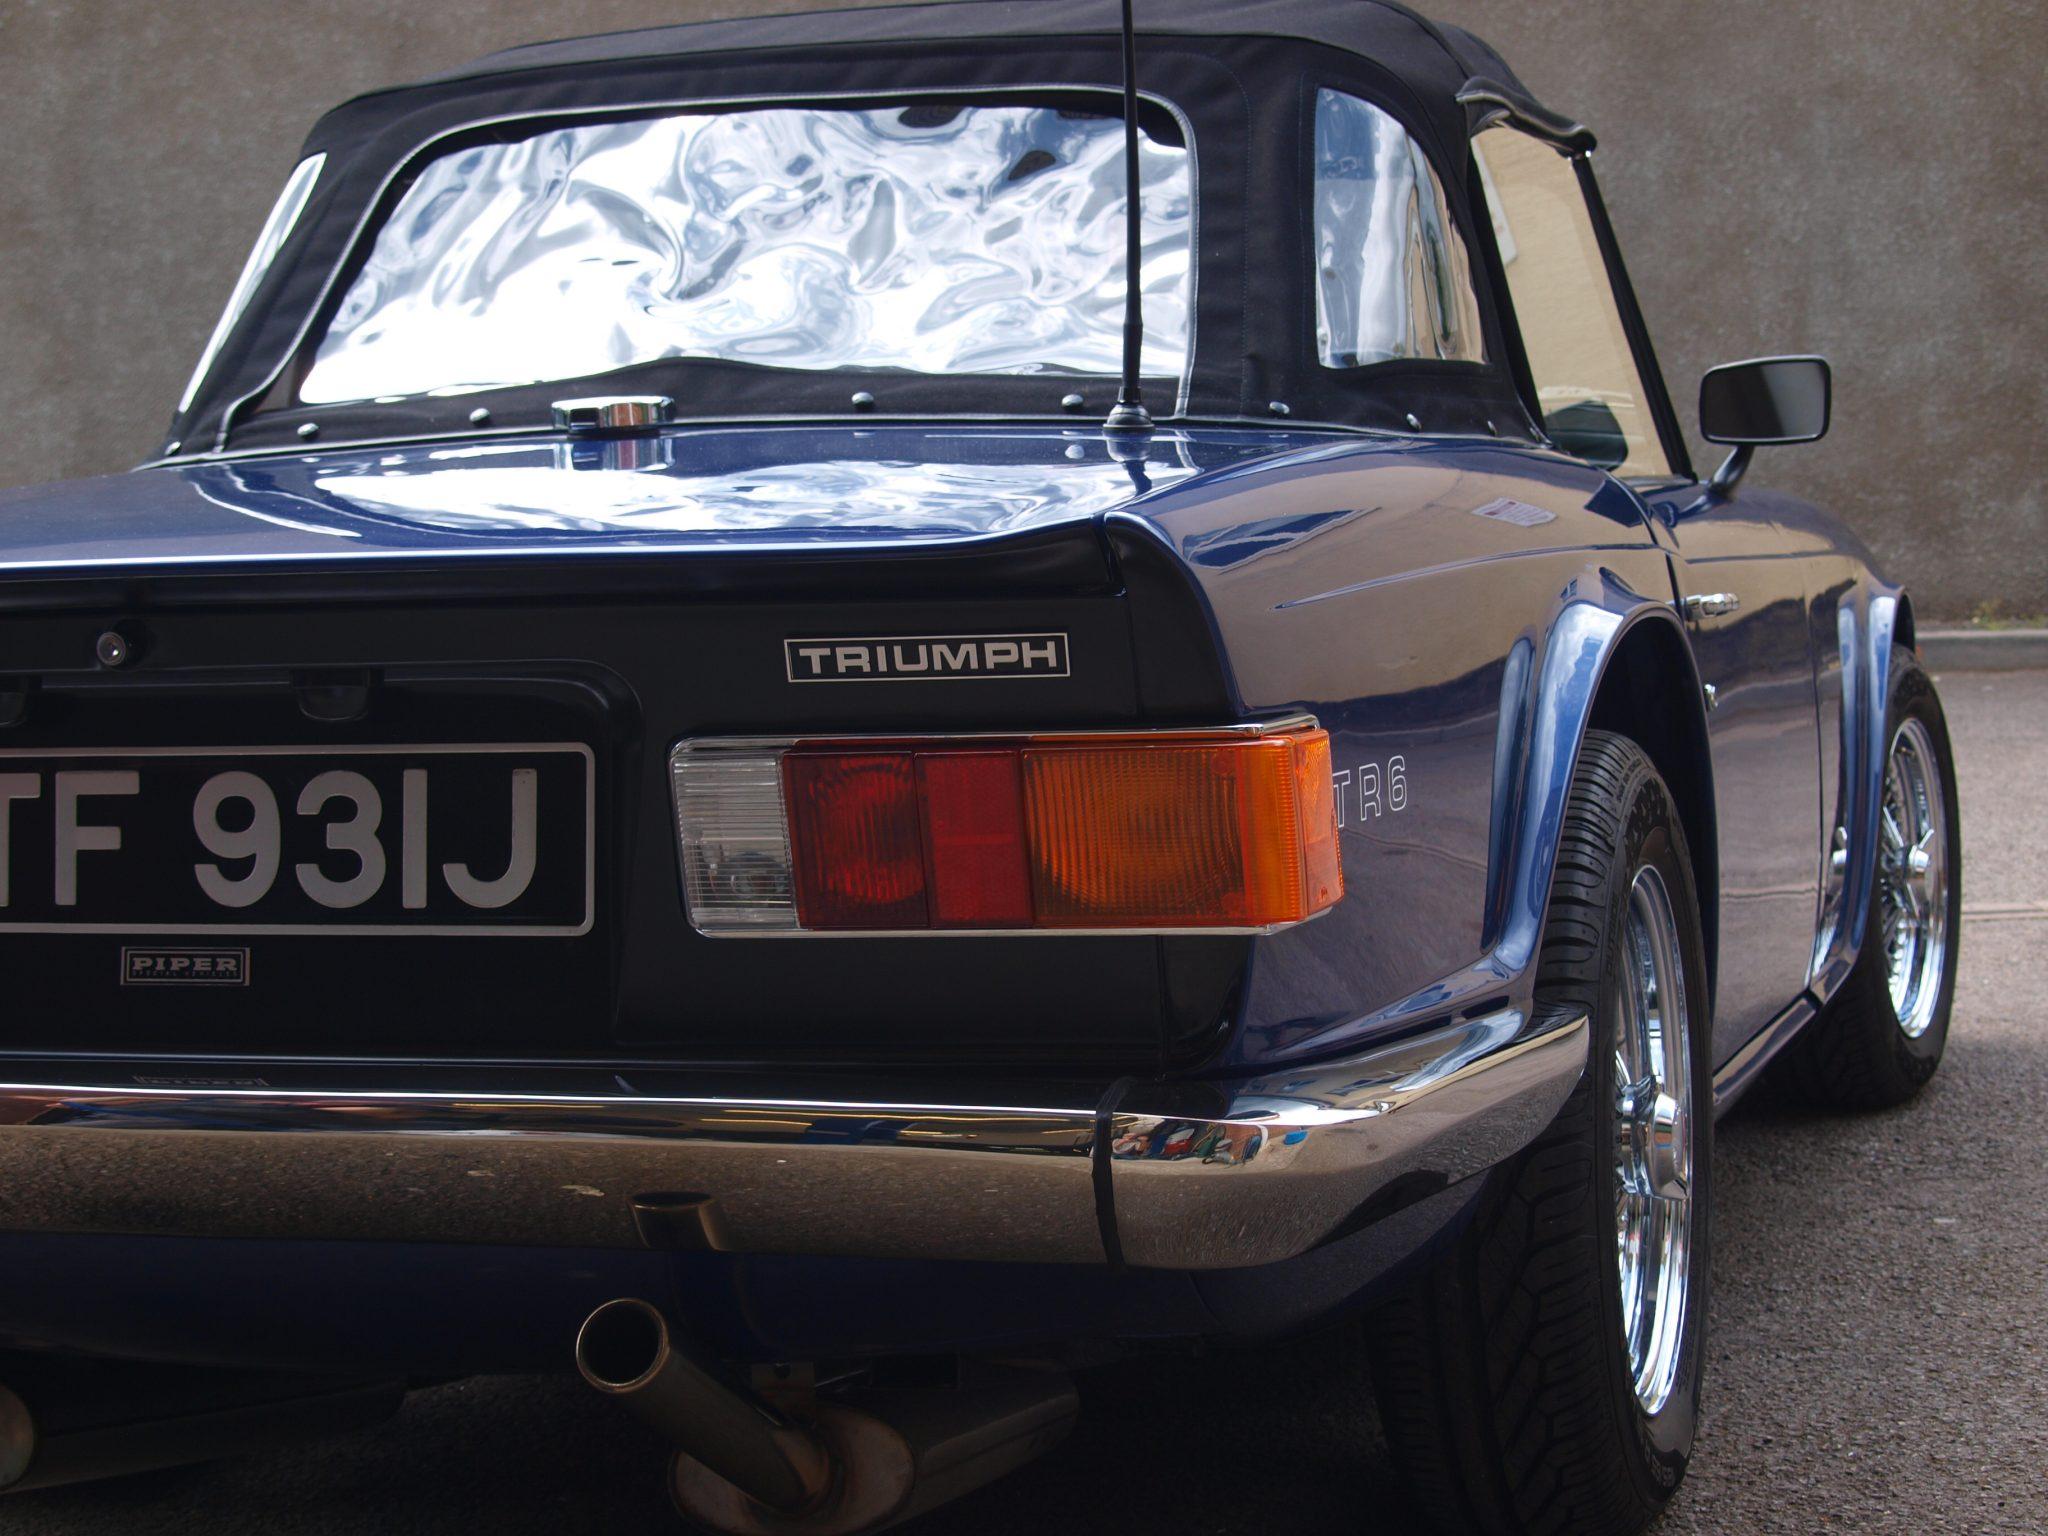 Triumph TR6 rear